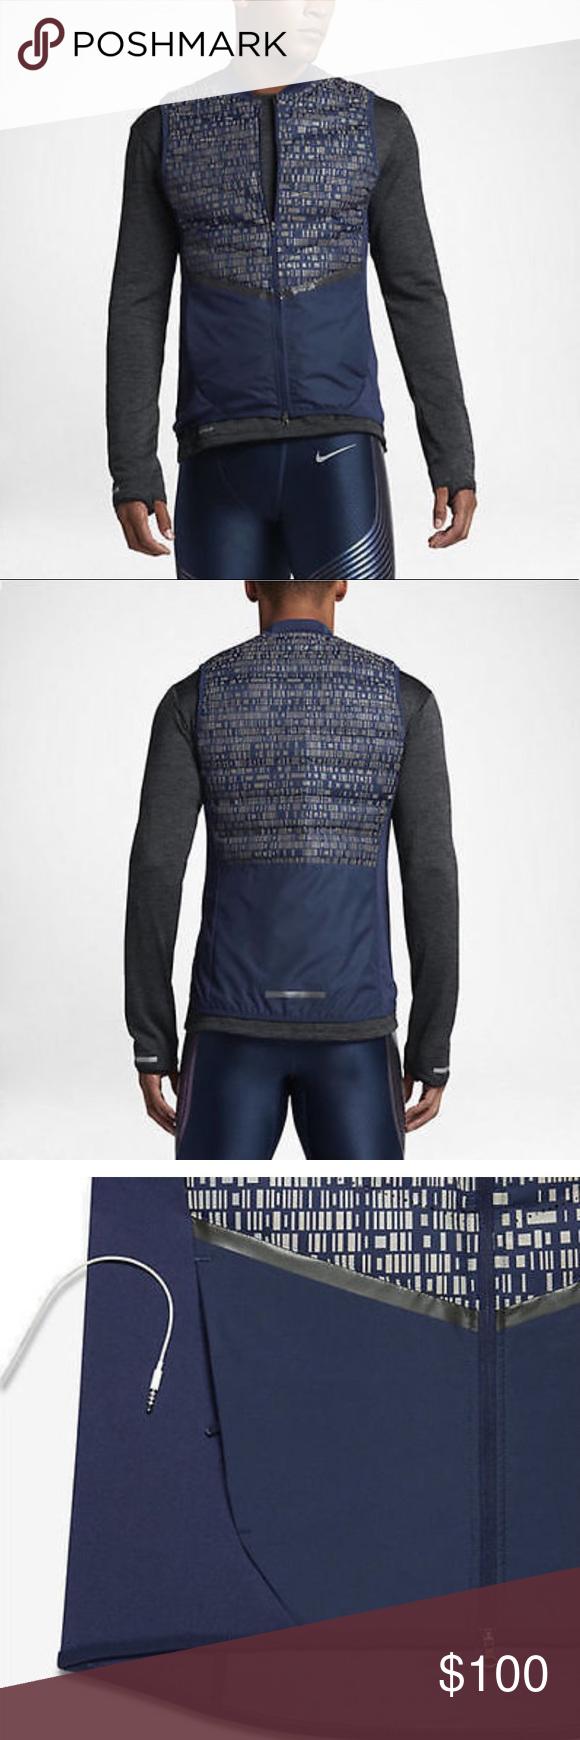 96d0c2faab0d Nike Men s Arroloft Flash Running Vest Only used once